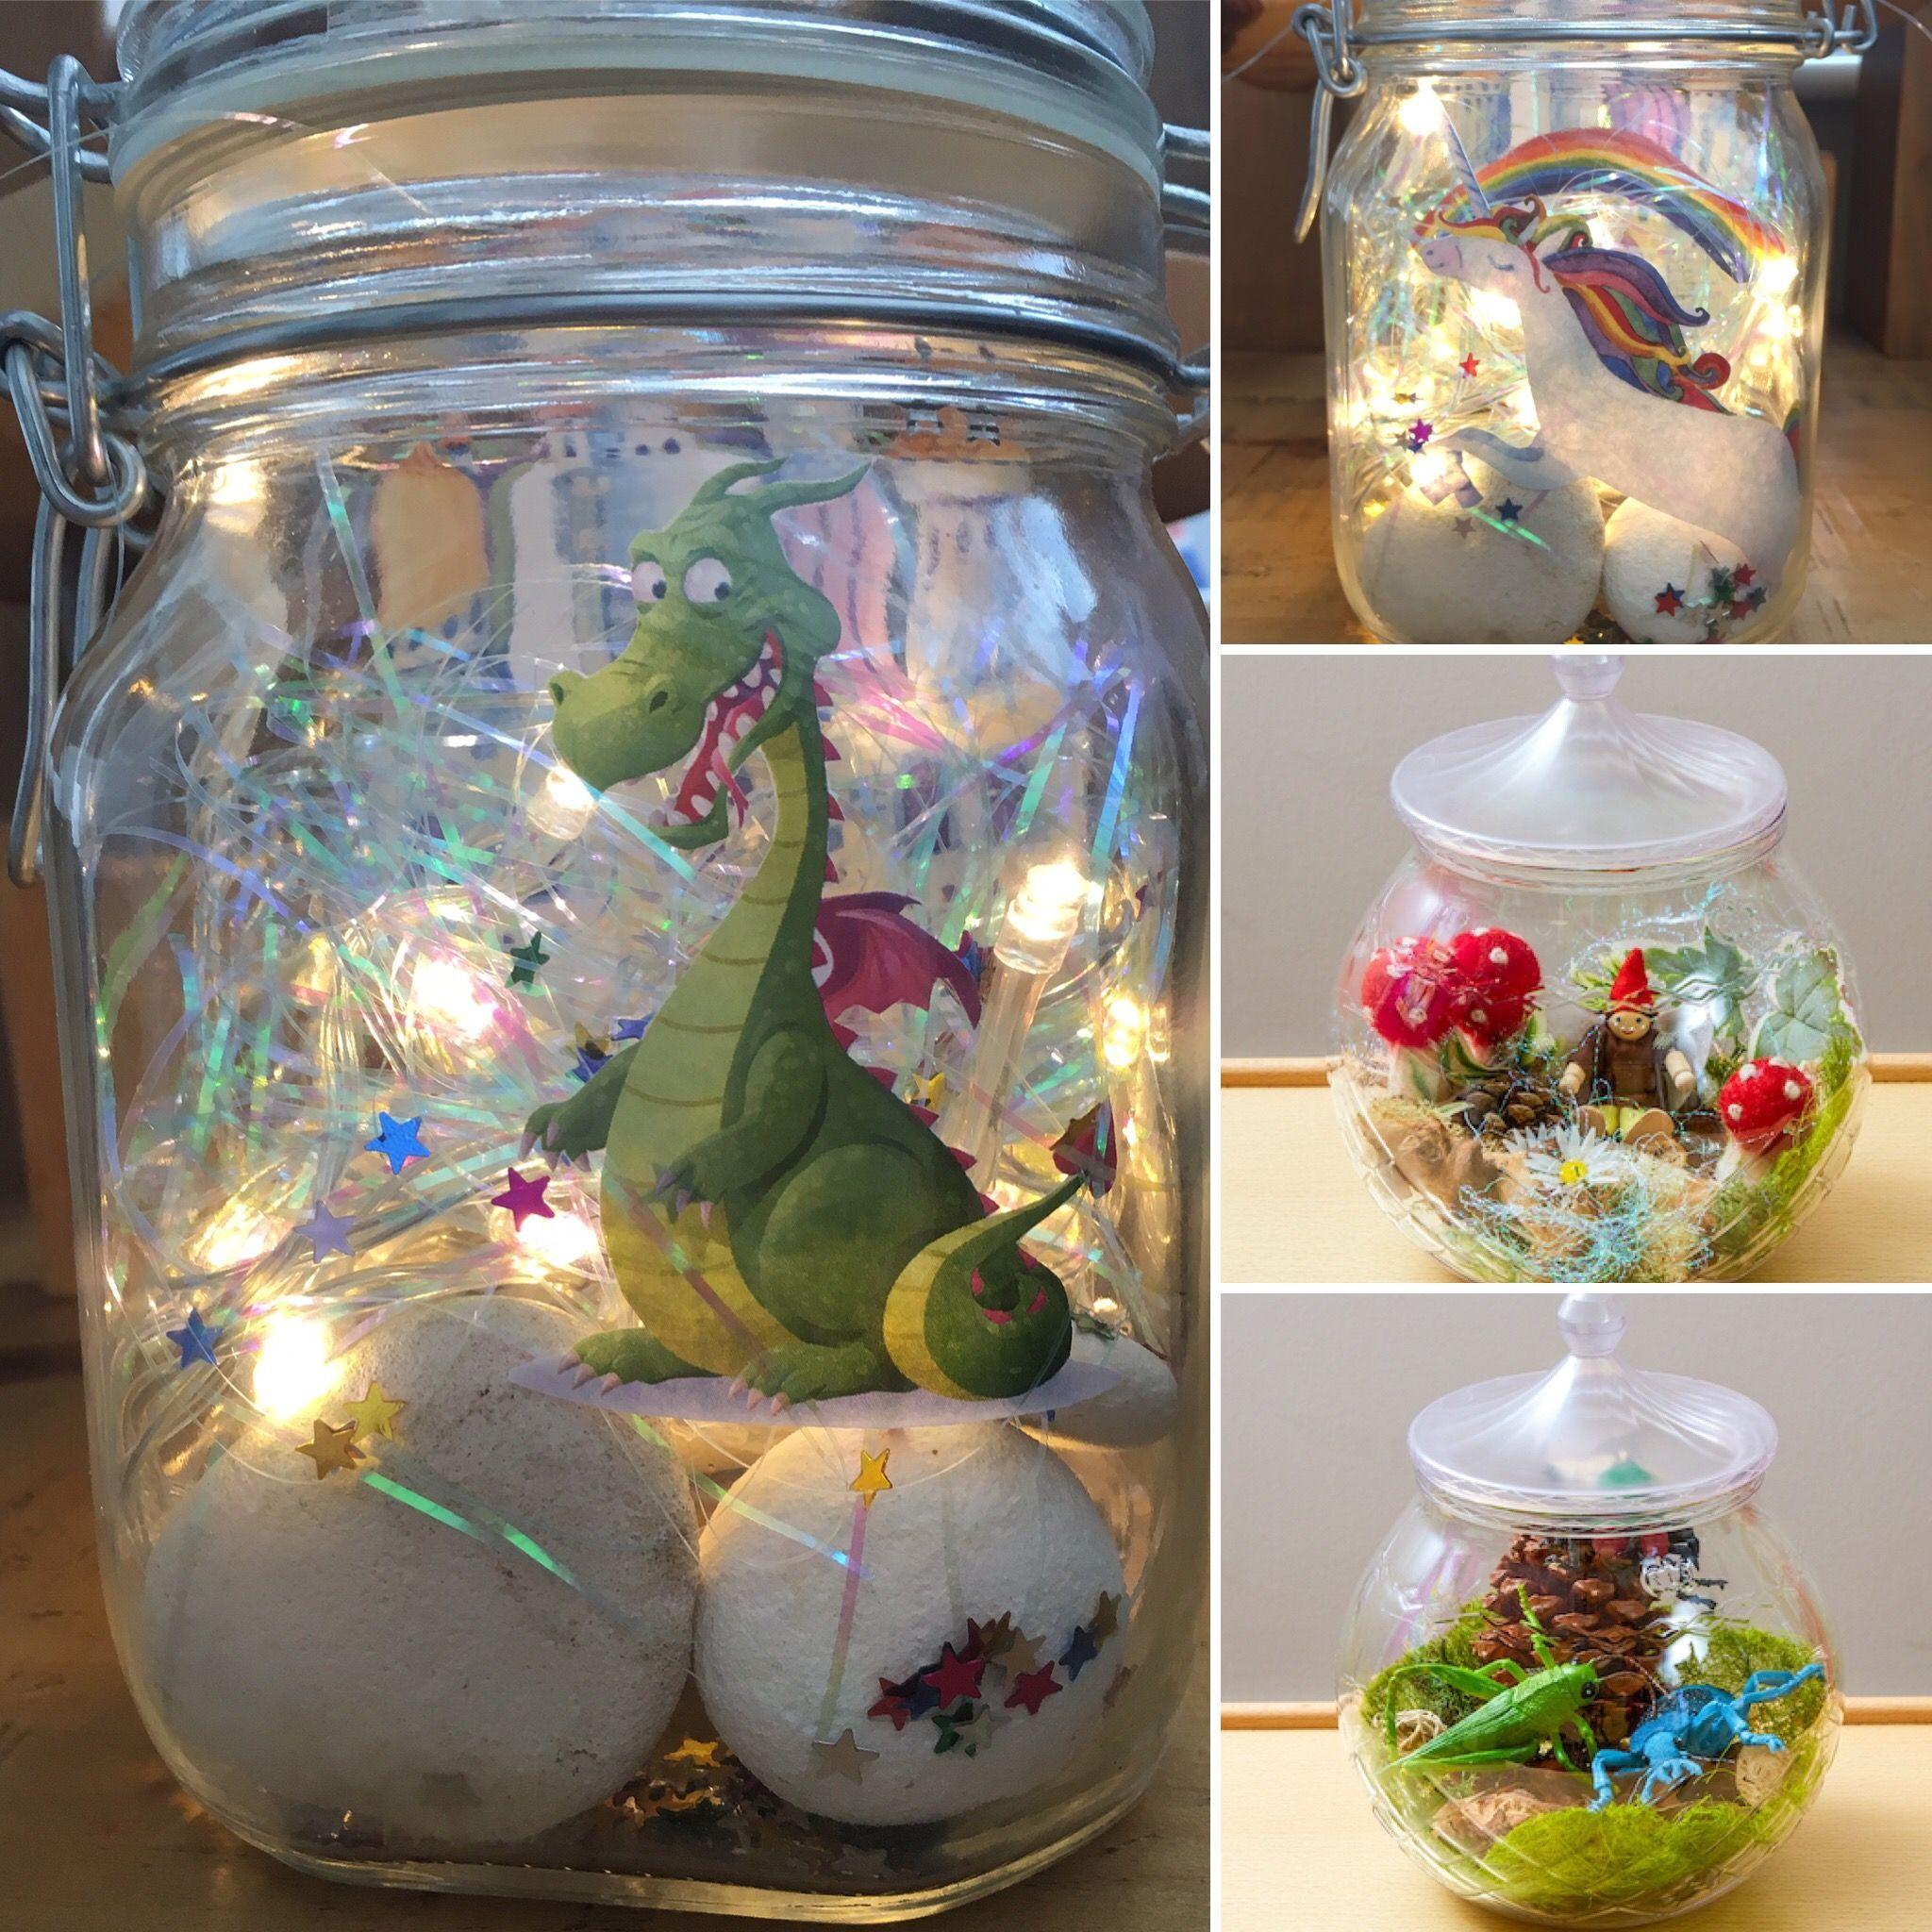 Roald Dahl Inspired Small World Dream Jars Dream Jar Bfg Dream Jars Roald Dahl Activities